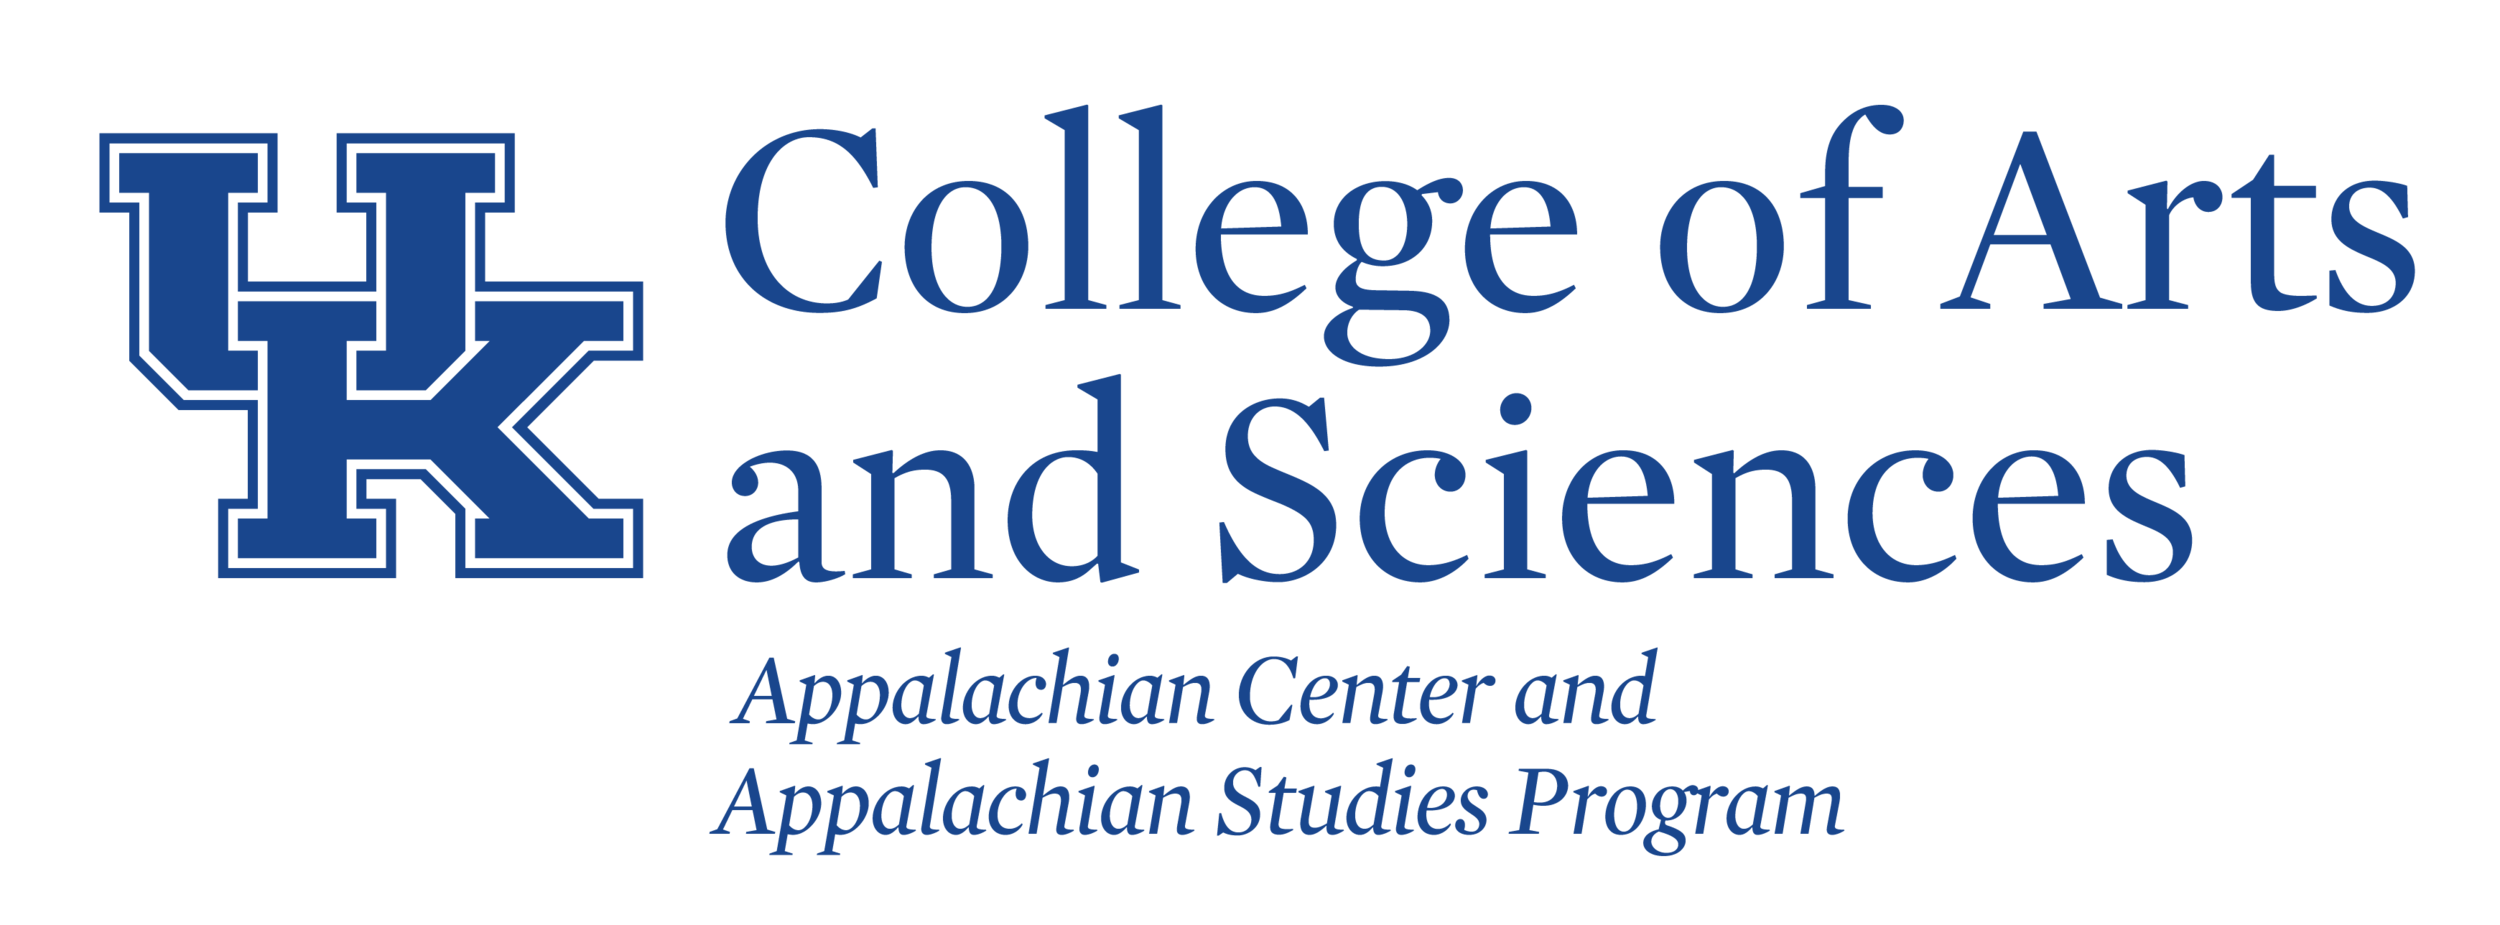 Appalachian Center and Studies Program-286.png